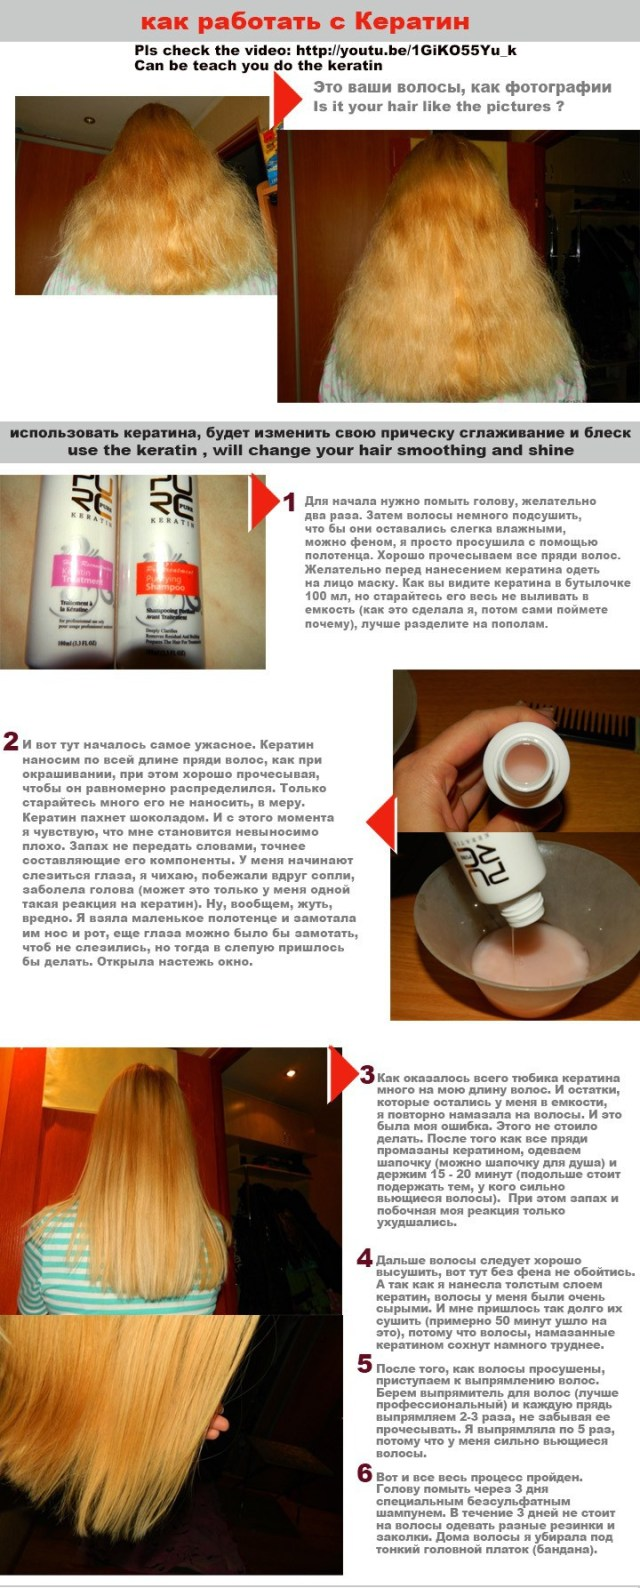 keratin and purifying shamoo how to use it